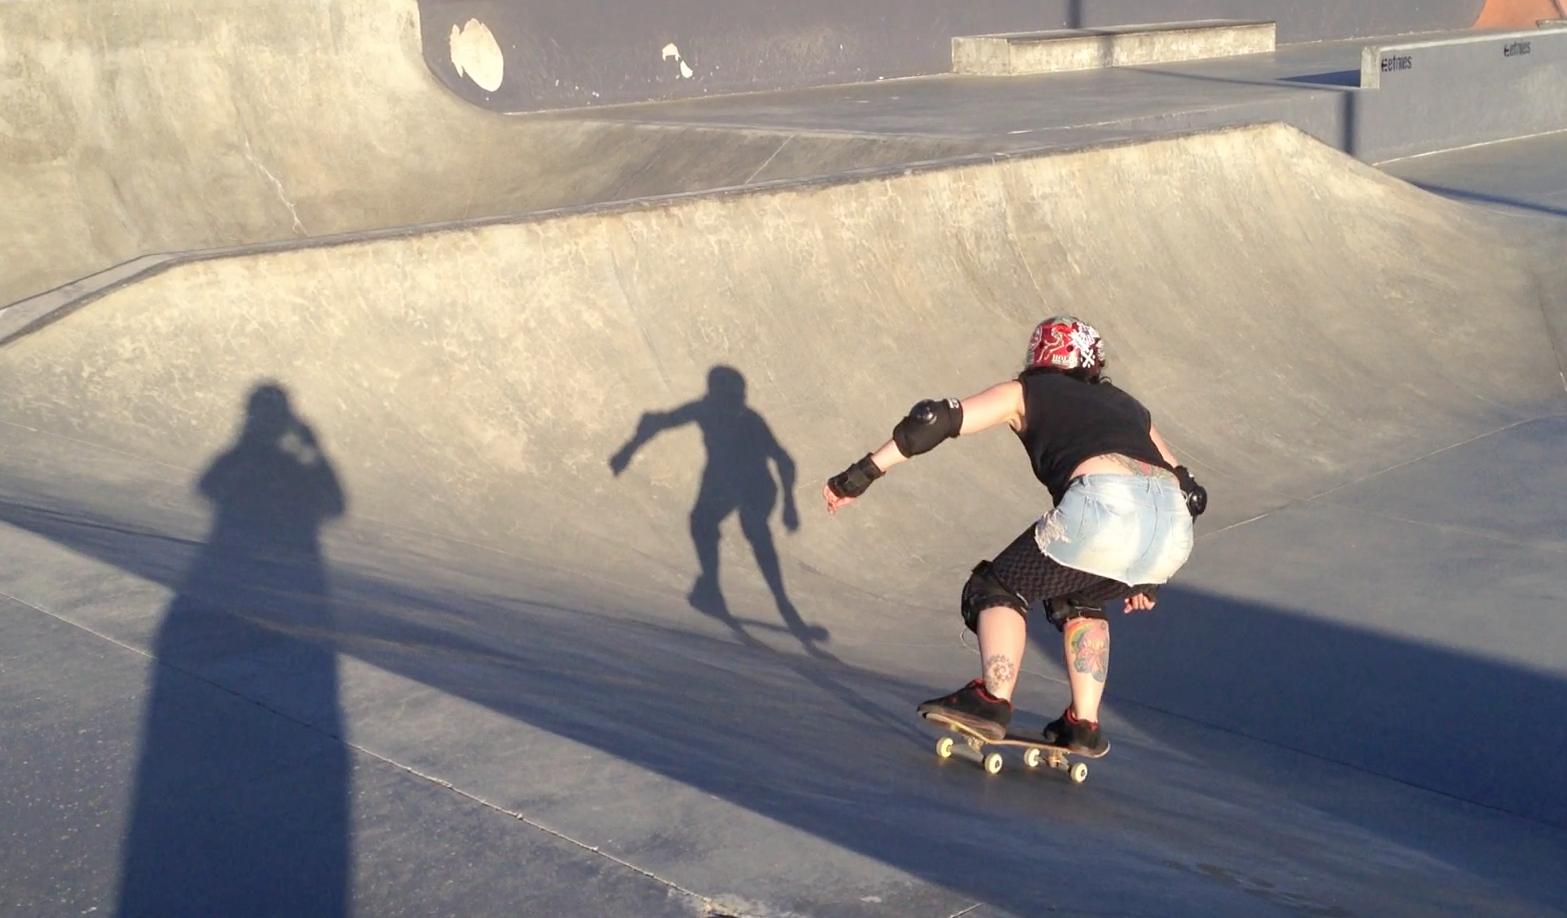 Me on my skateboard